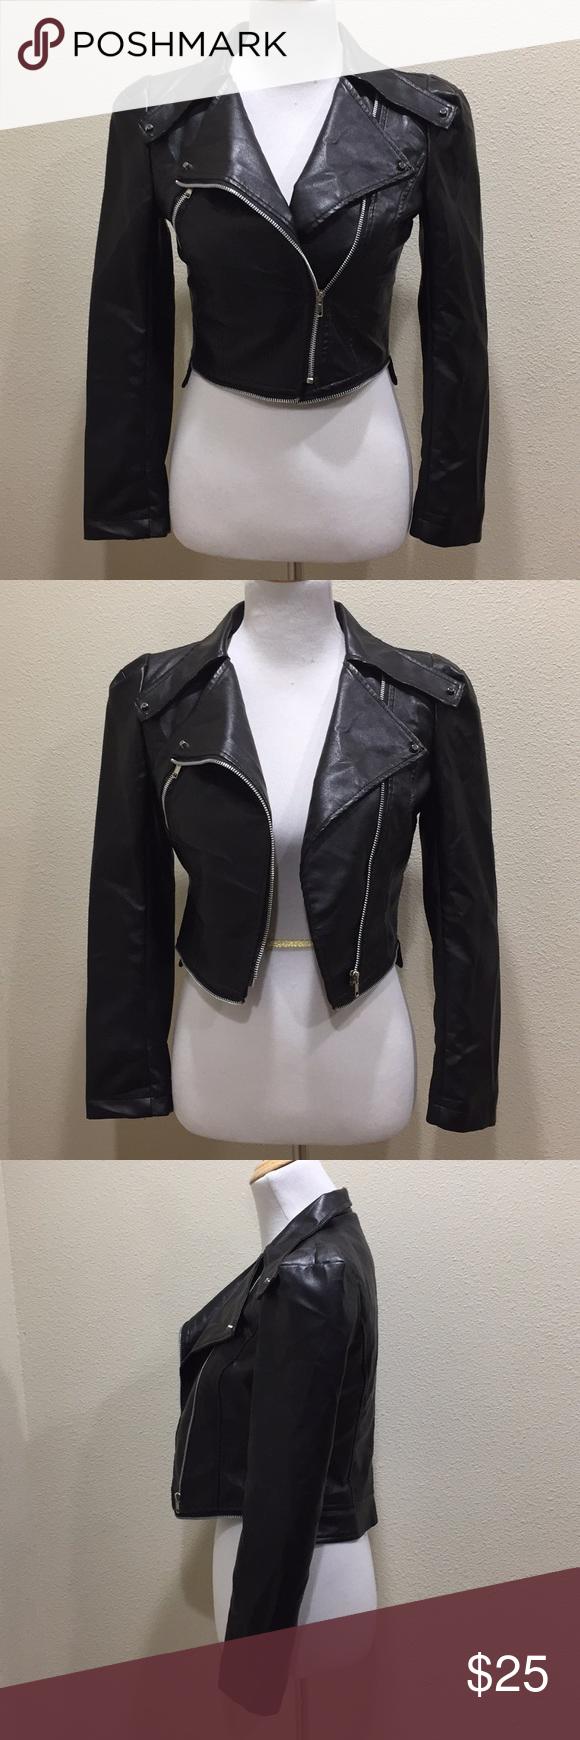 Black faux leather jacket Very skinny black leather jacket